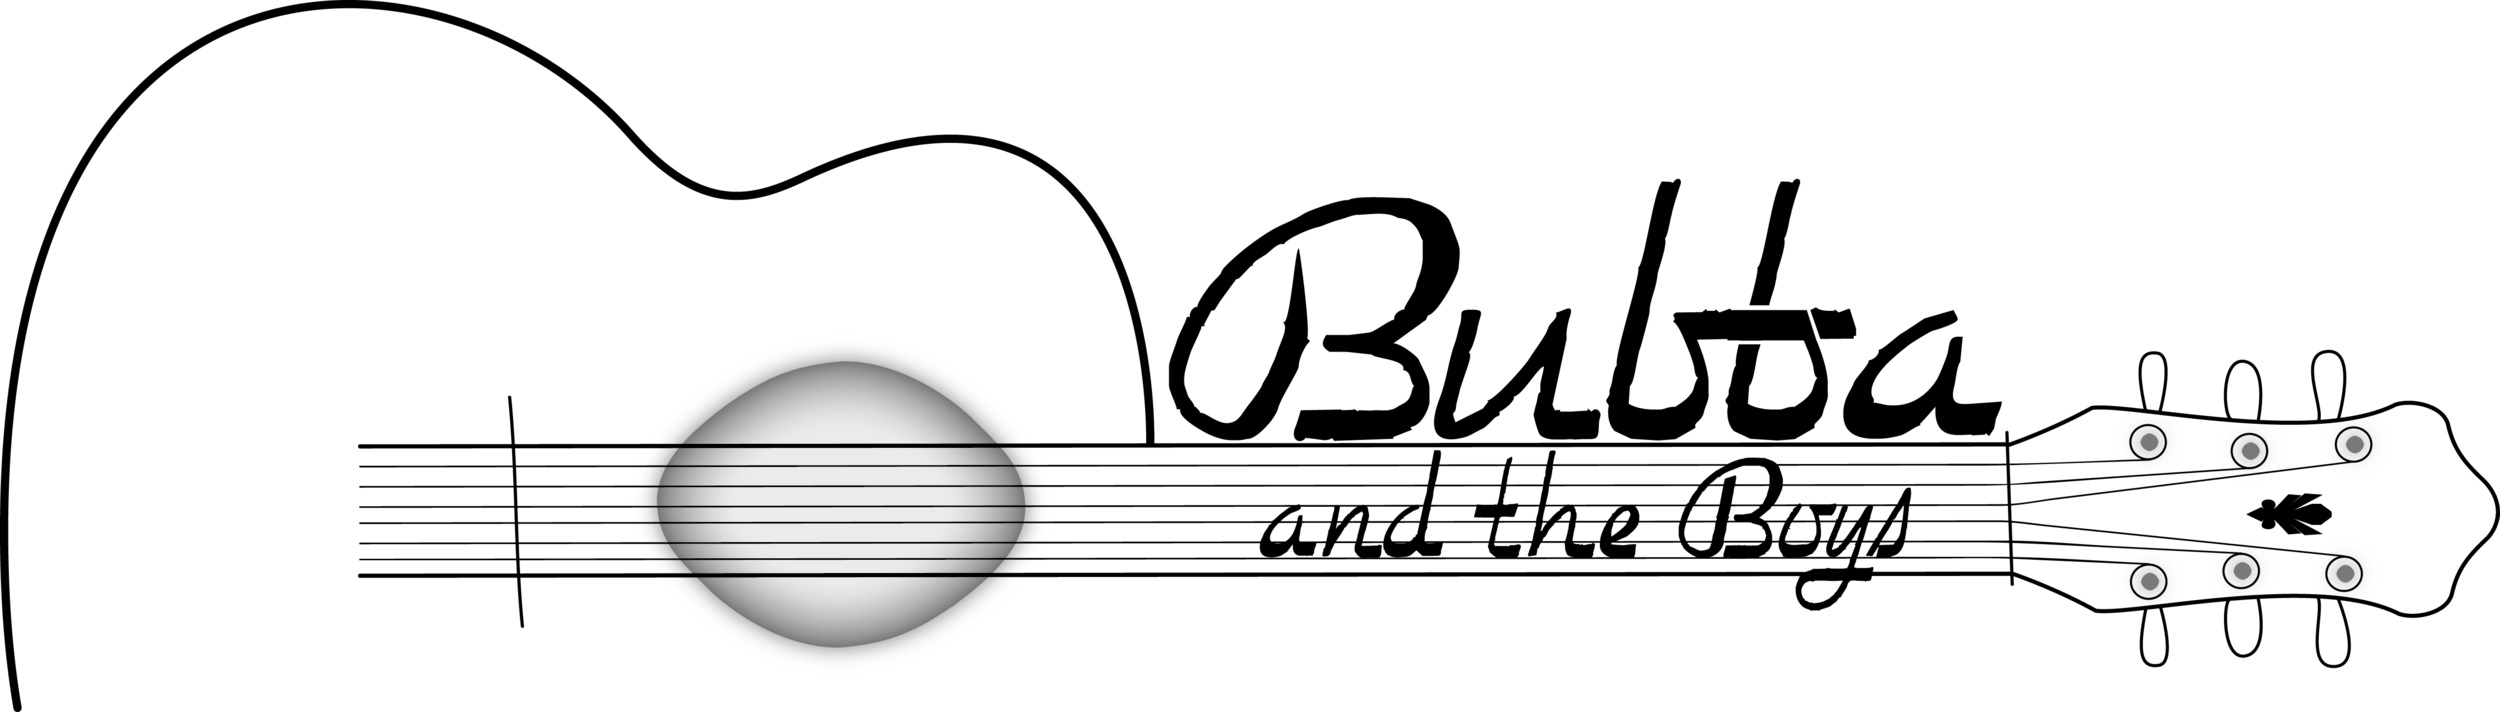 Bubba_FINAL-web.jpg